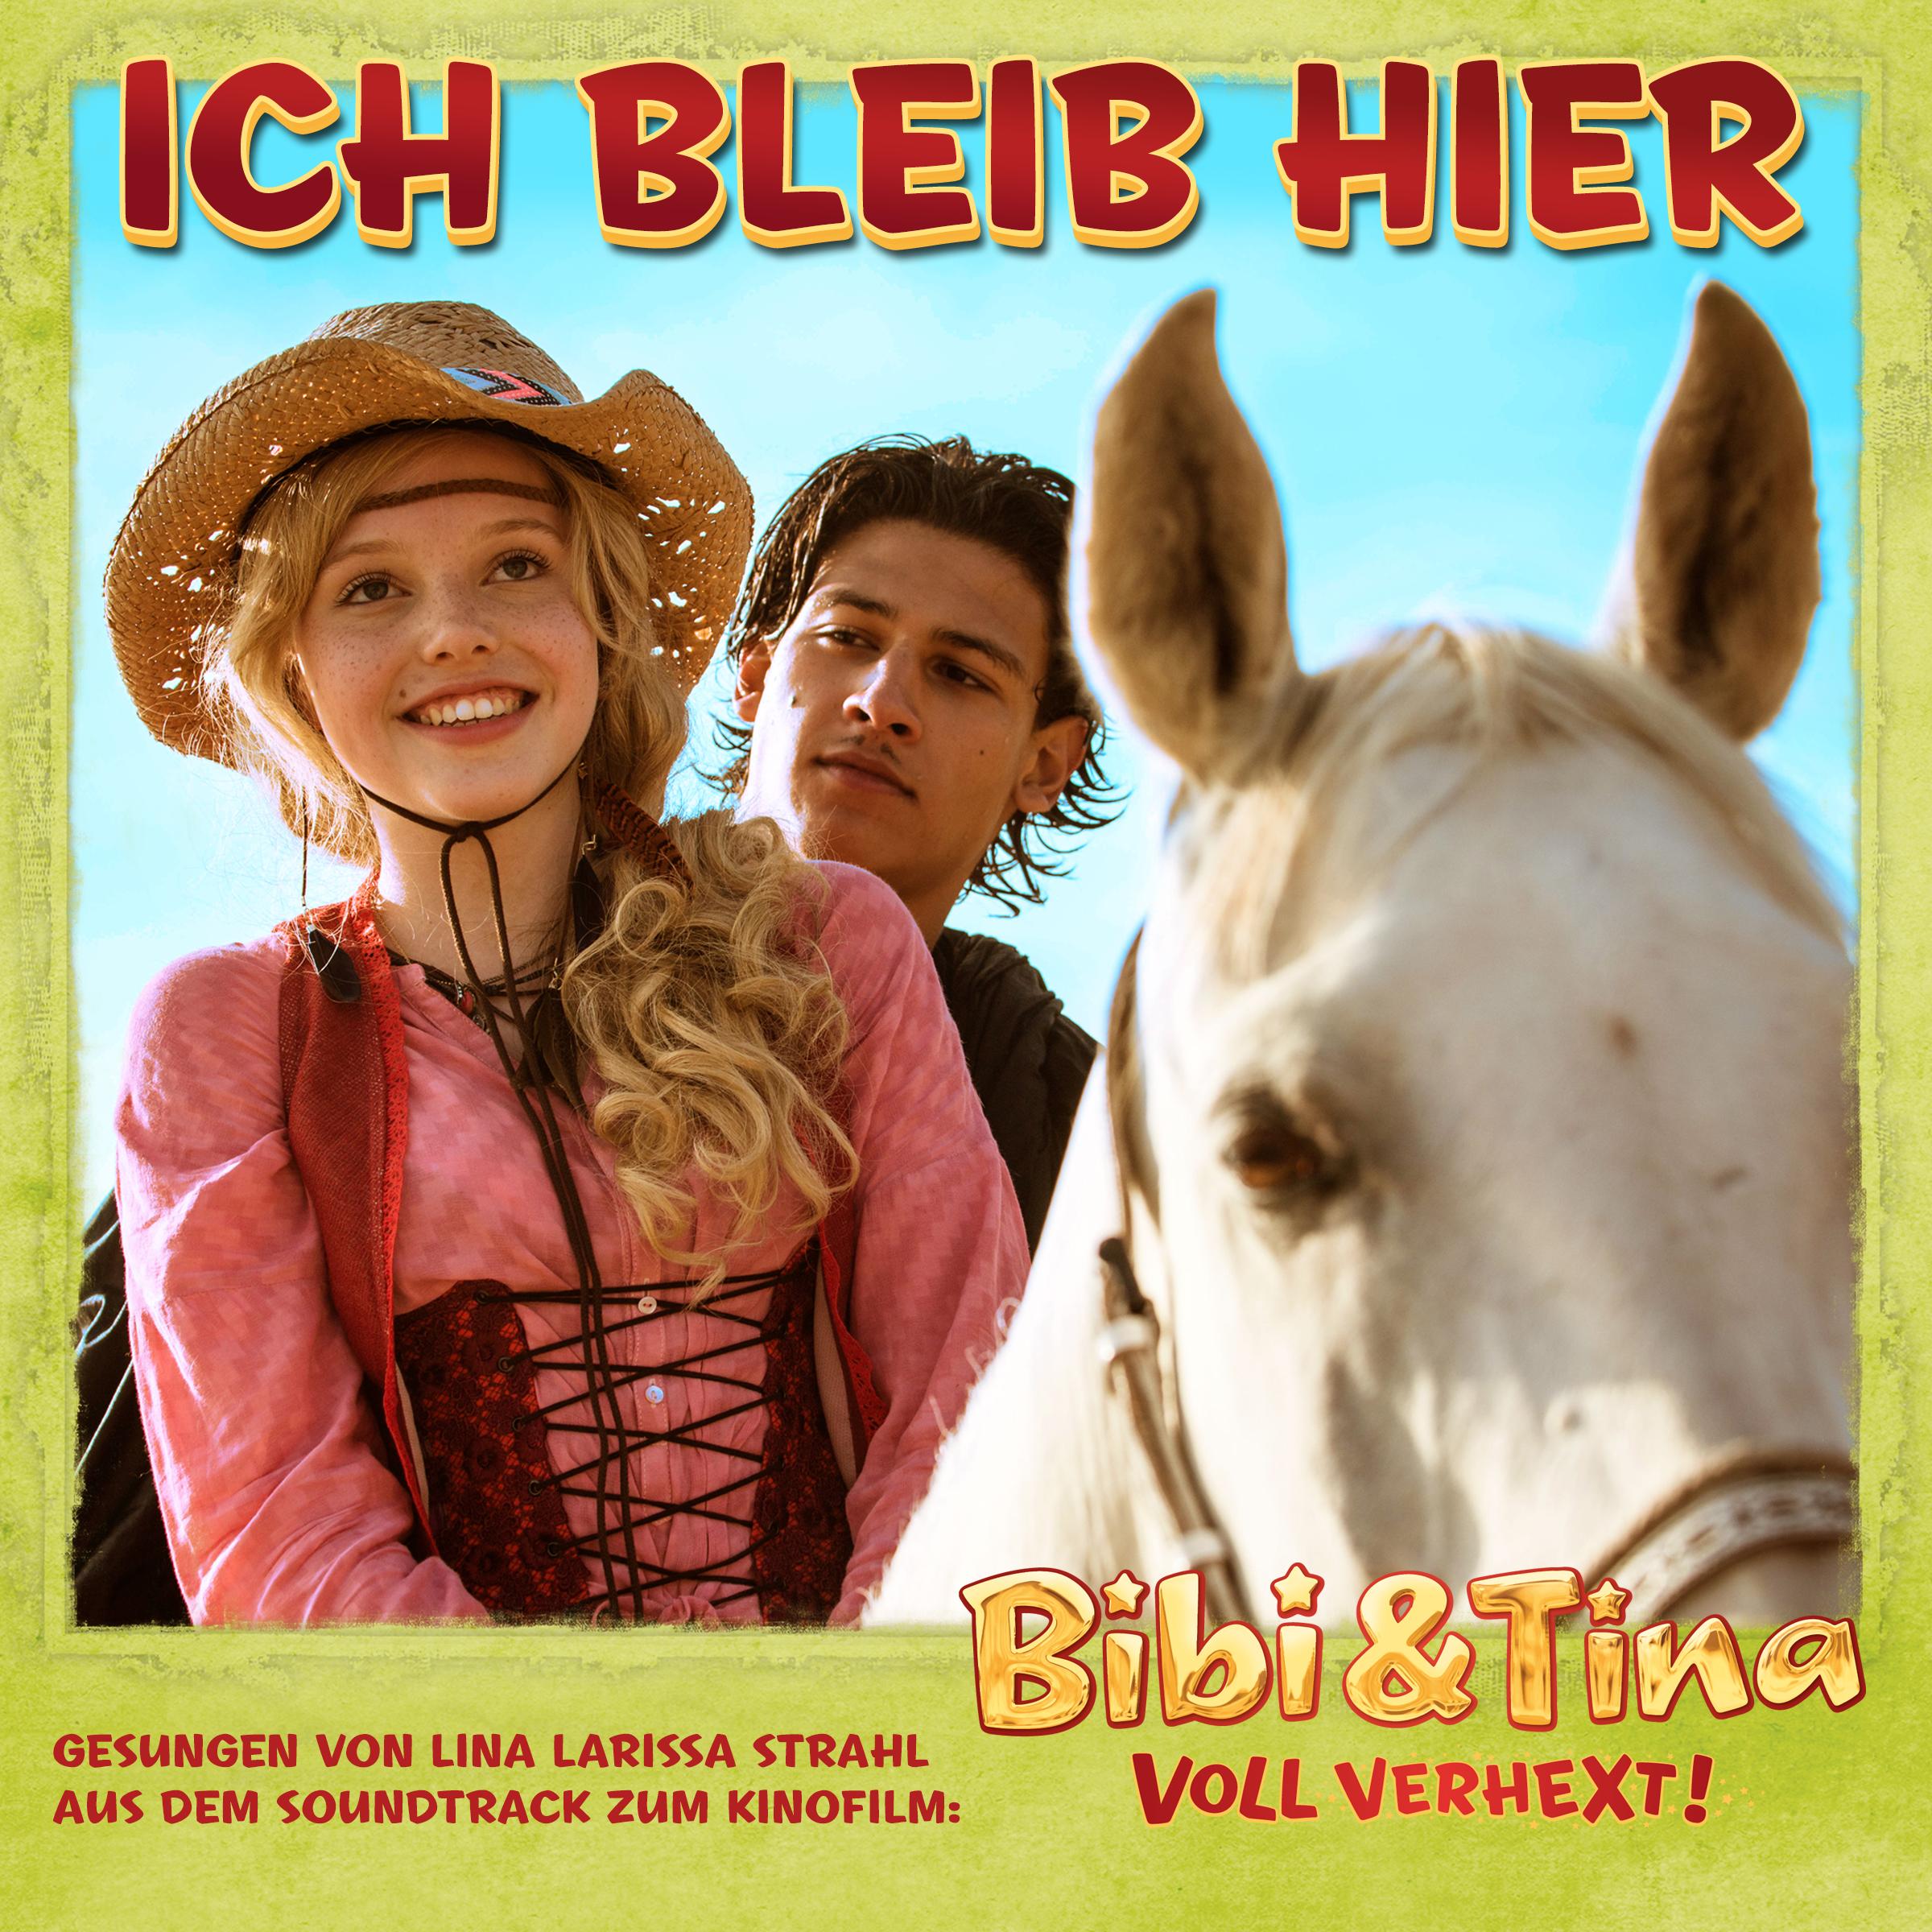 Bibi & Tina: Ich bleib hier (Single - MP3 Downl...